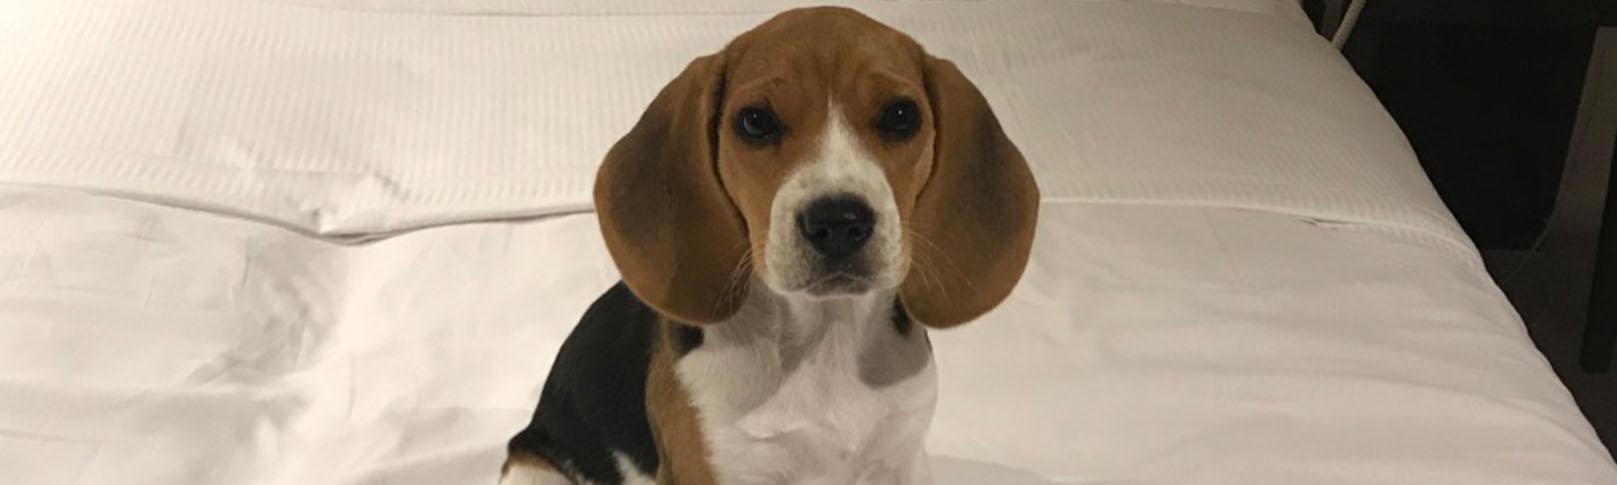 Mon beagle à 2 mois